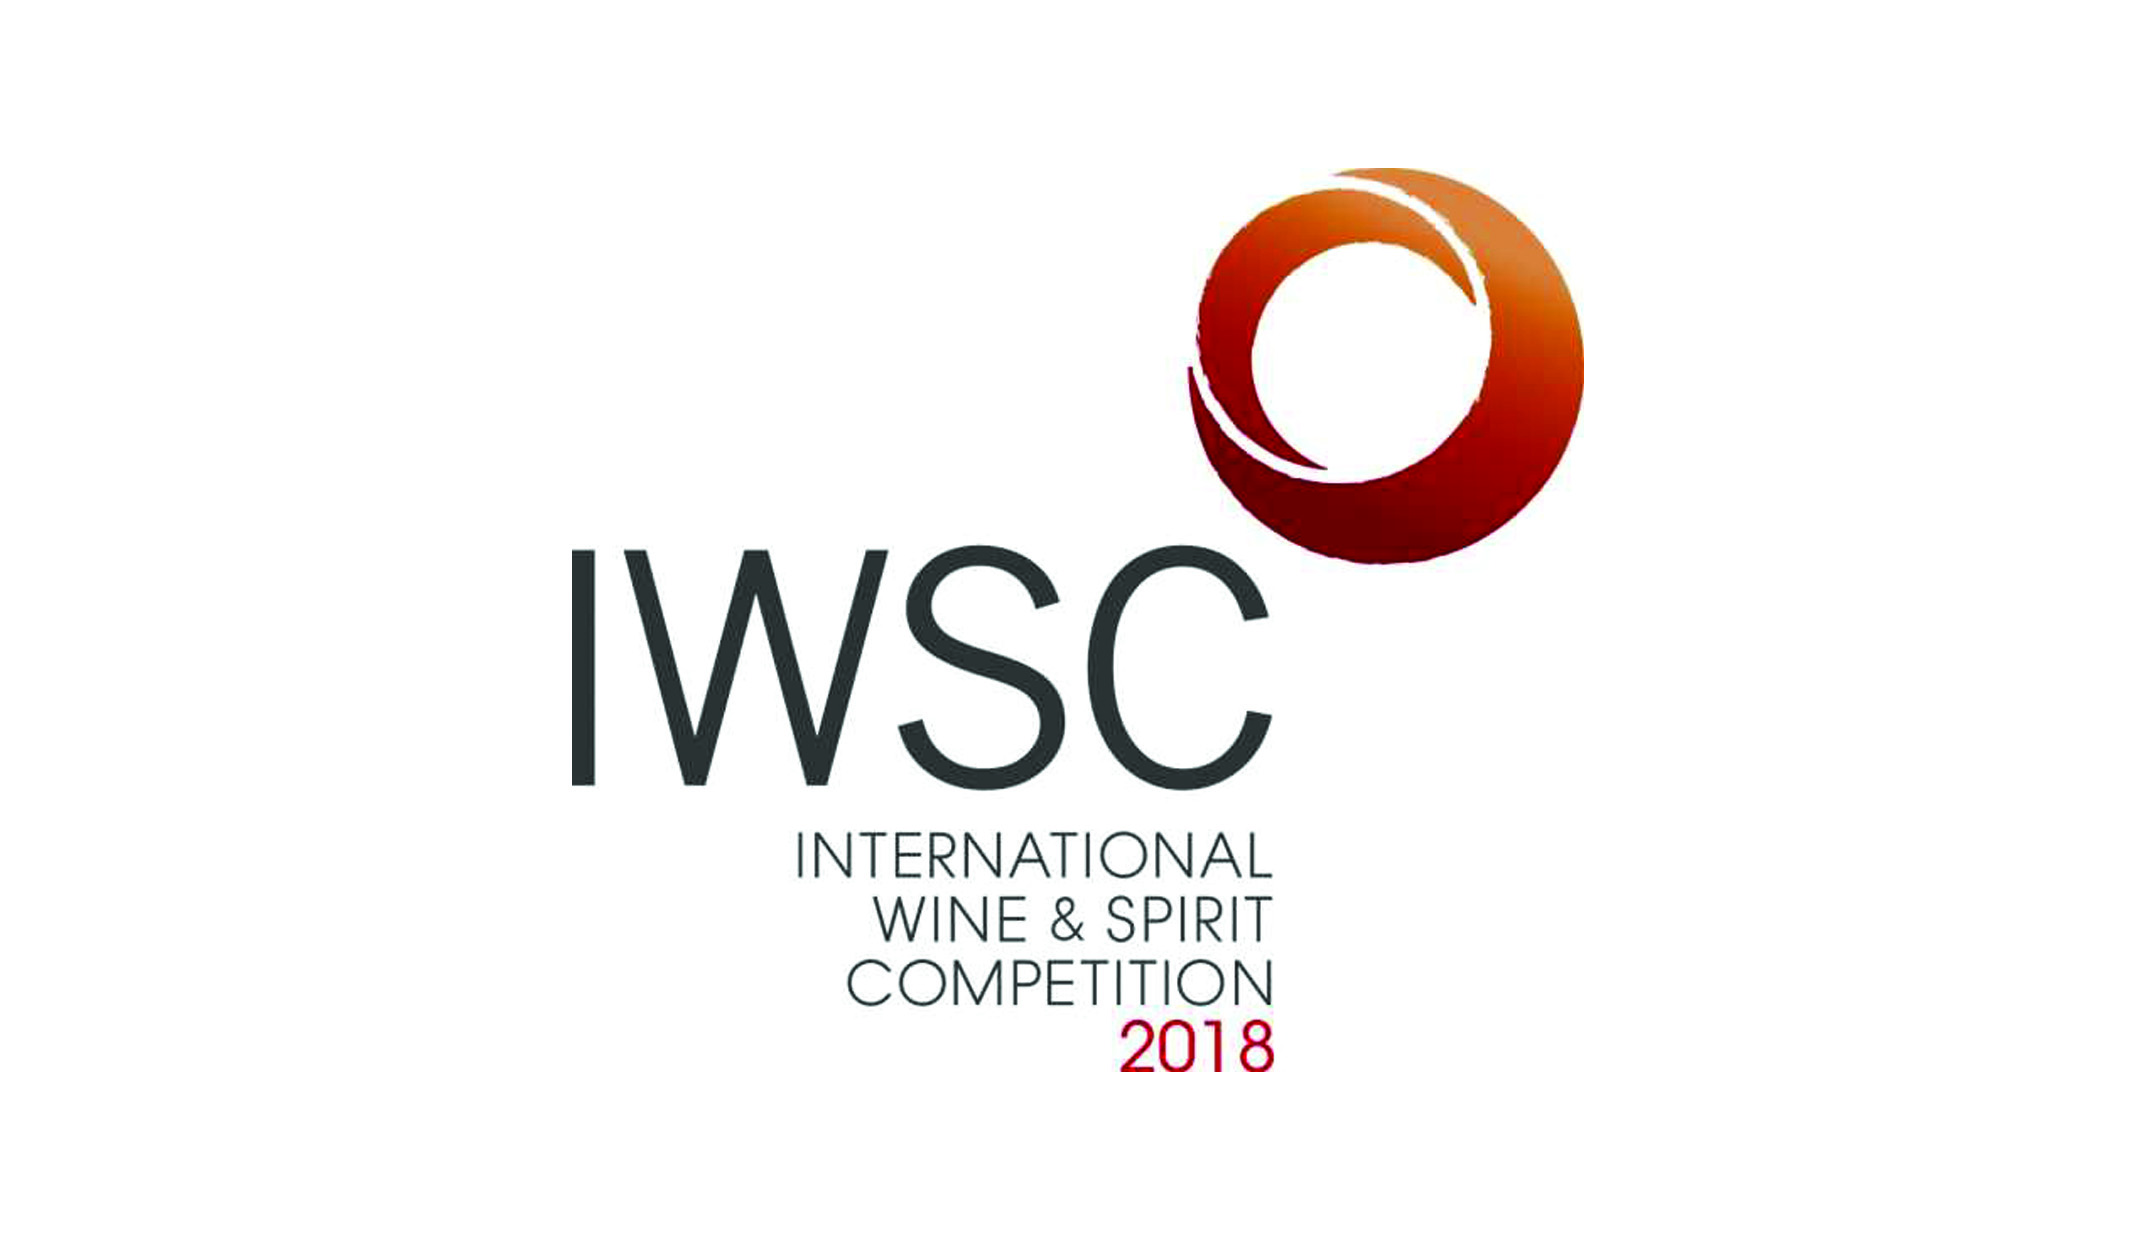 IWSC_2018.jpg